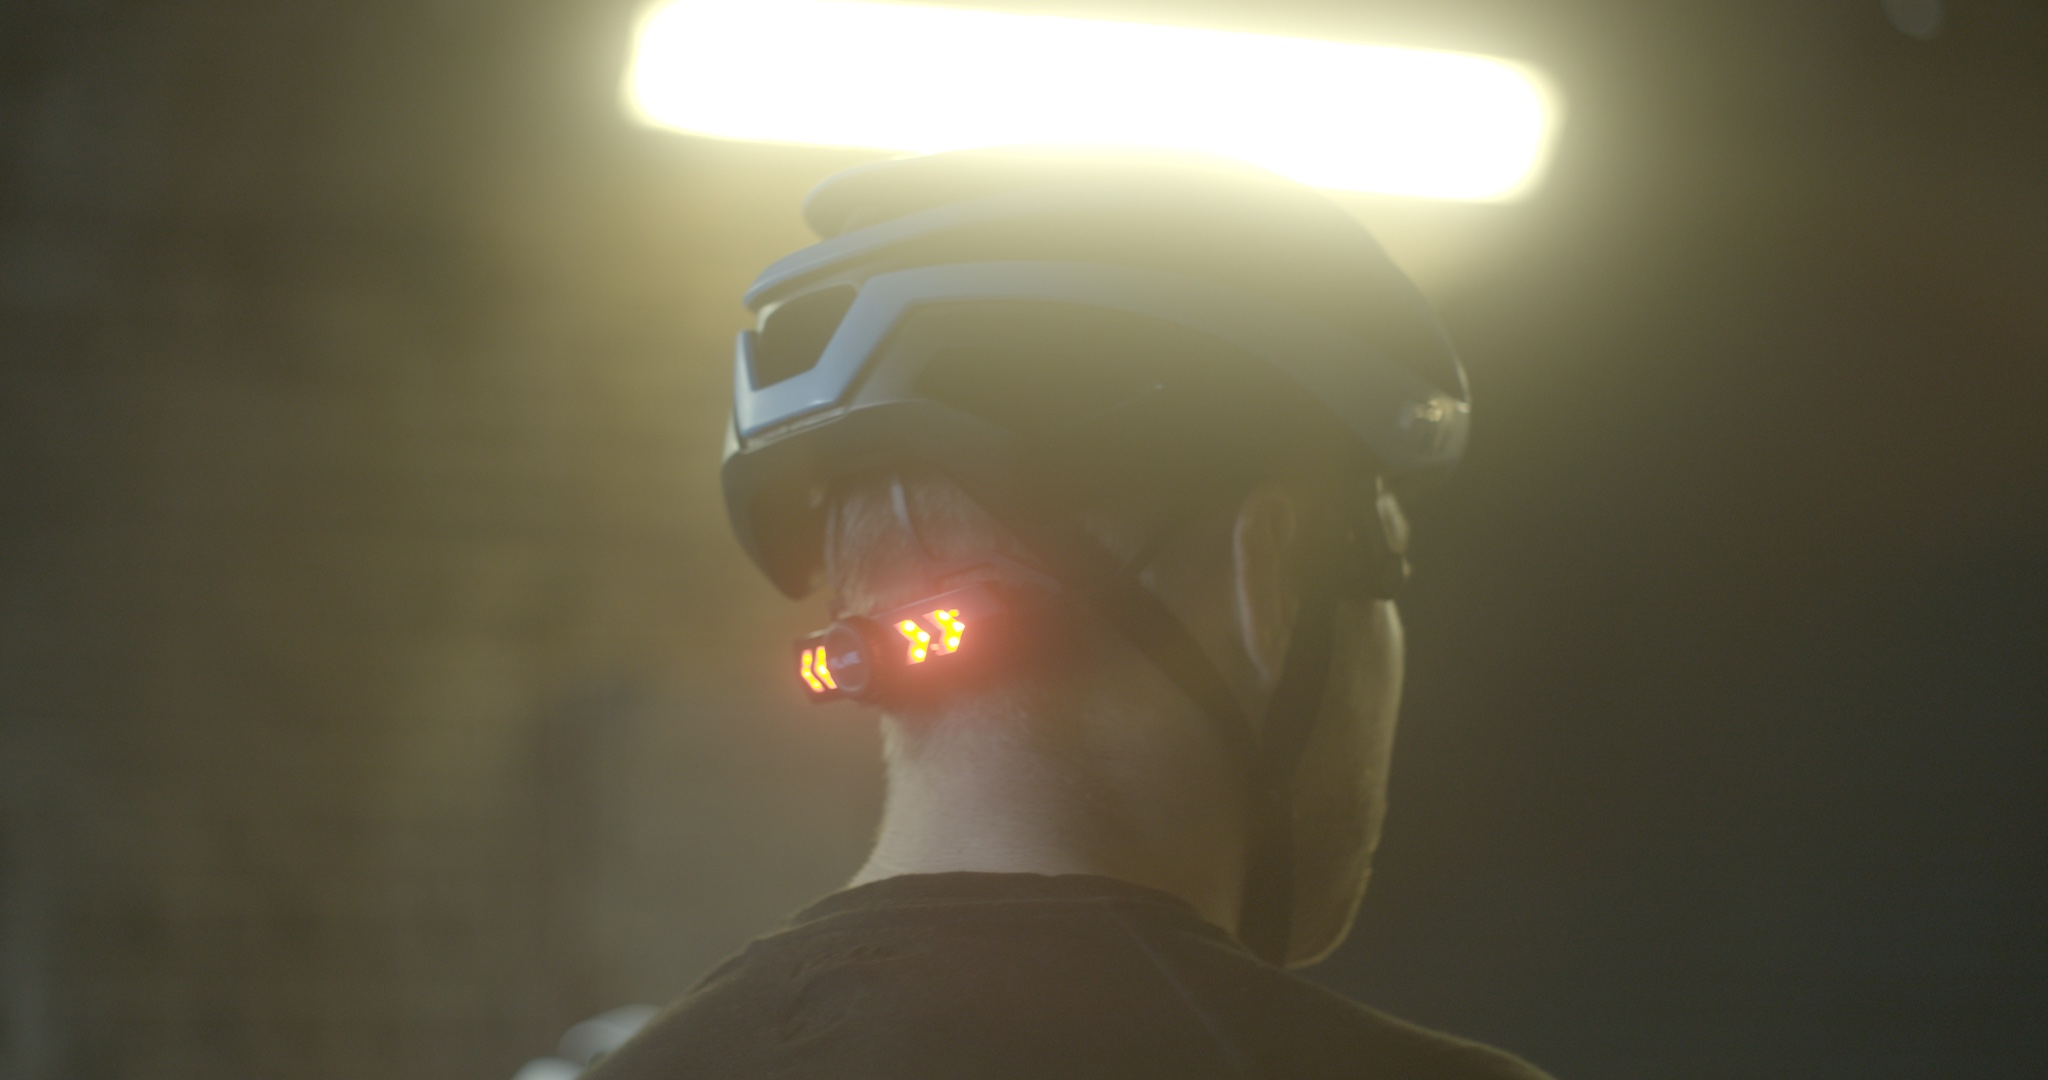 This 'Smart' Bike Helmet Has a Bluetooth Speaker & Automatic